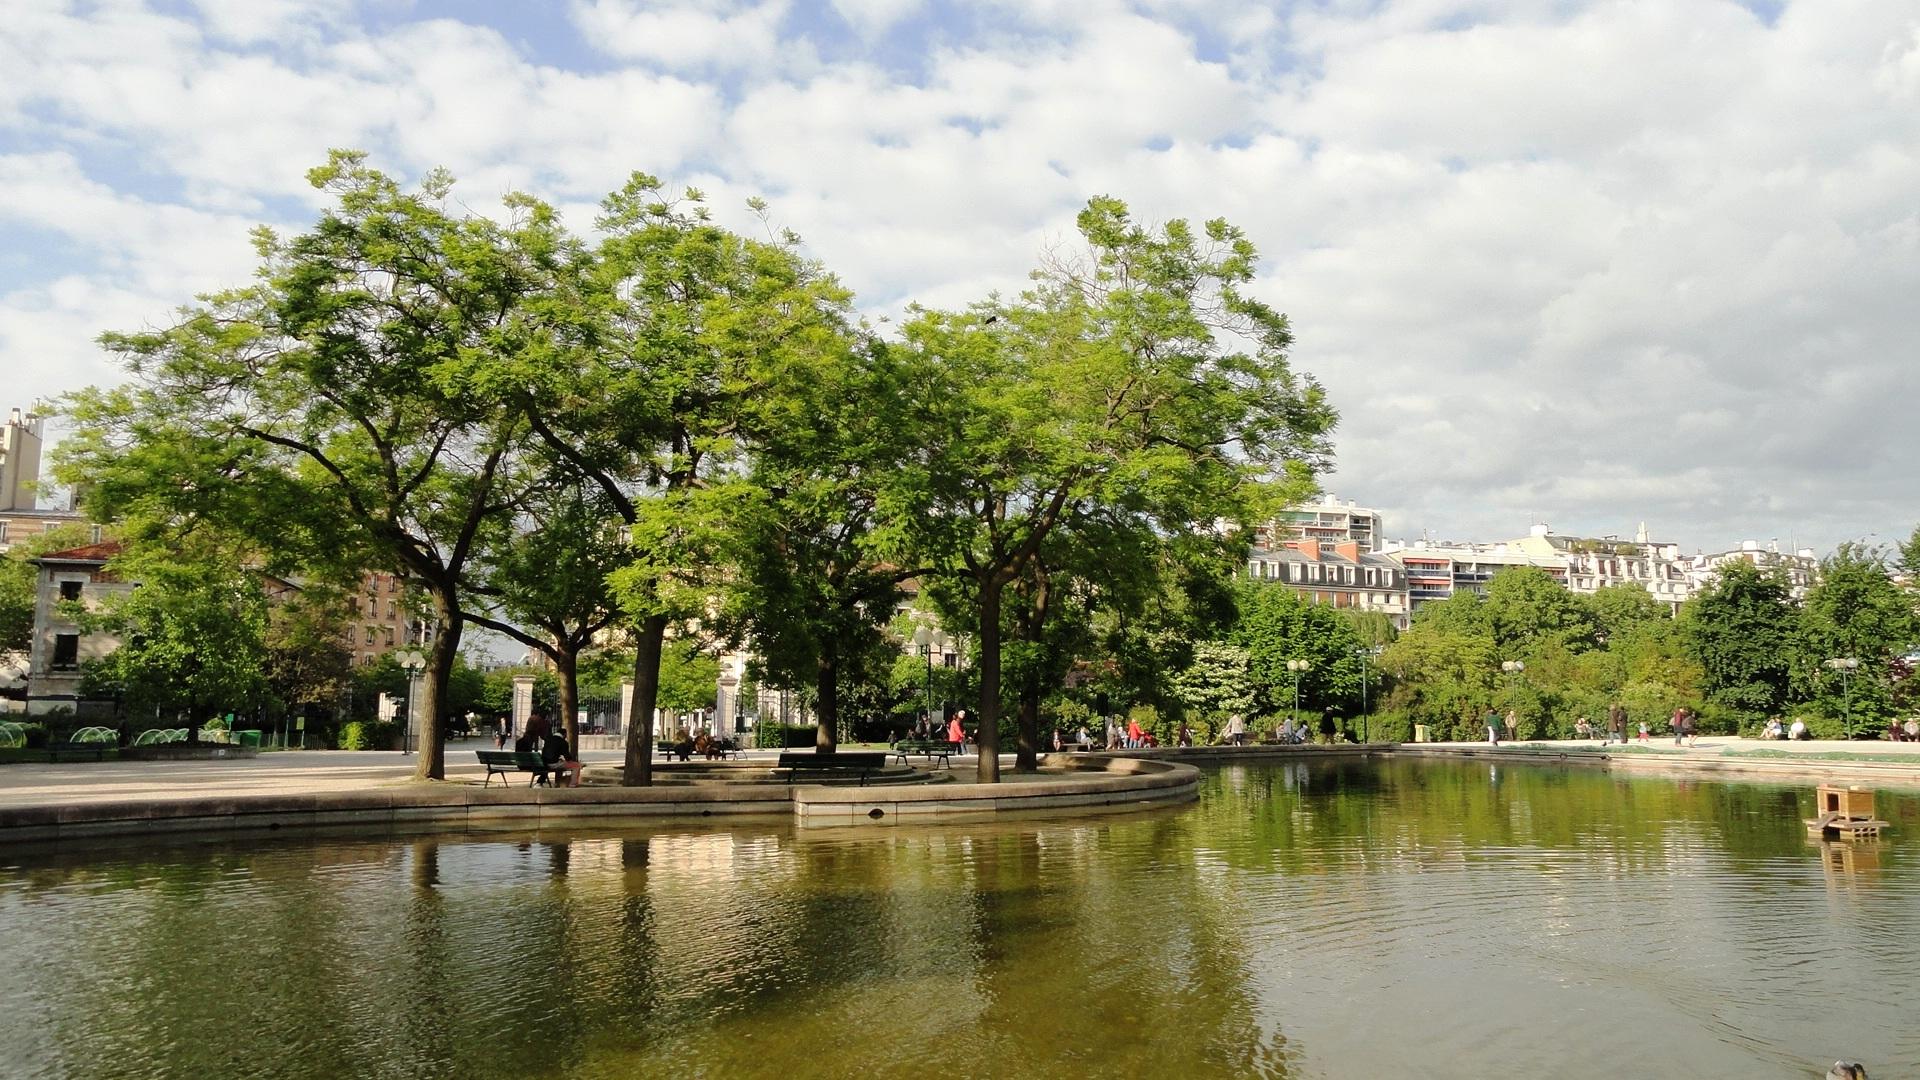 Parc Georges Brassens - Bassin